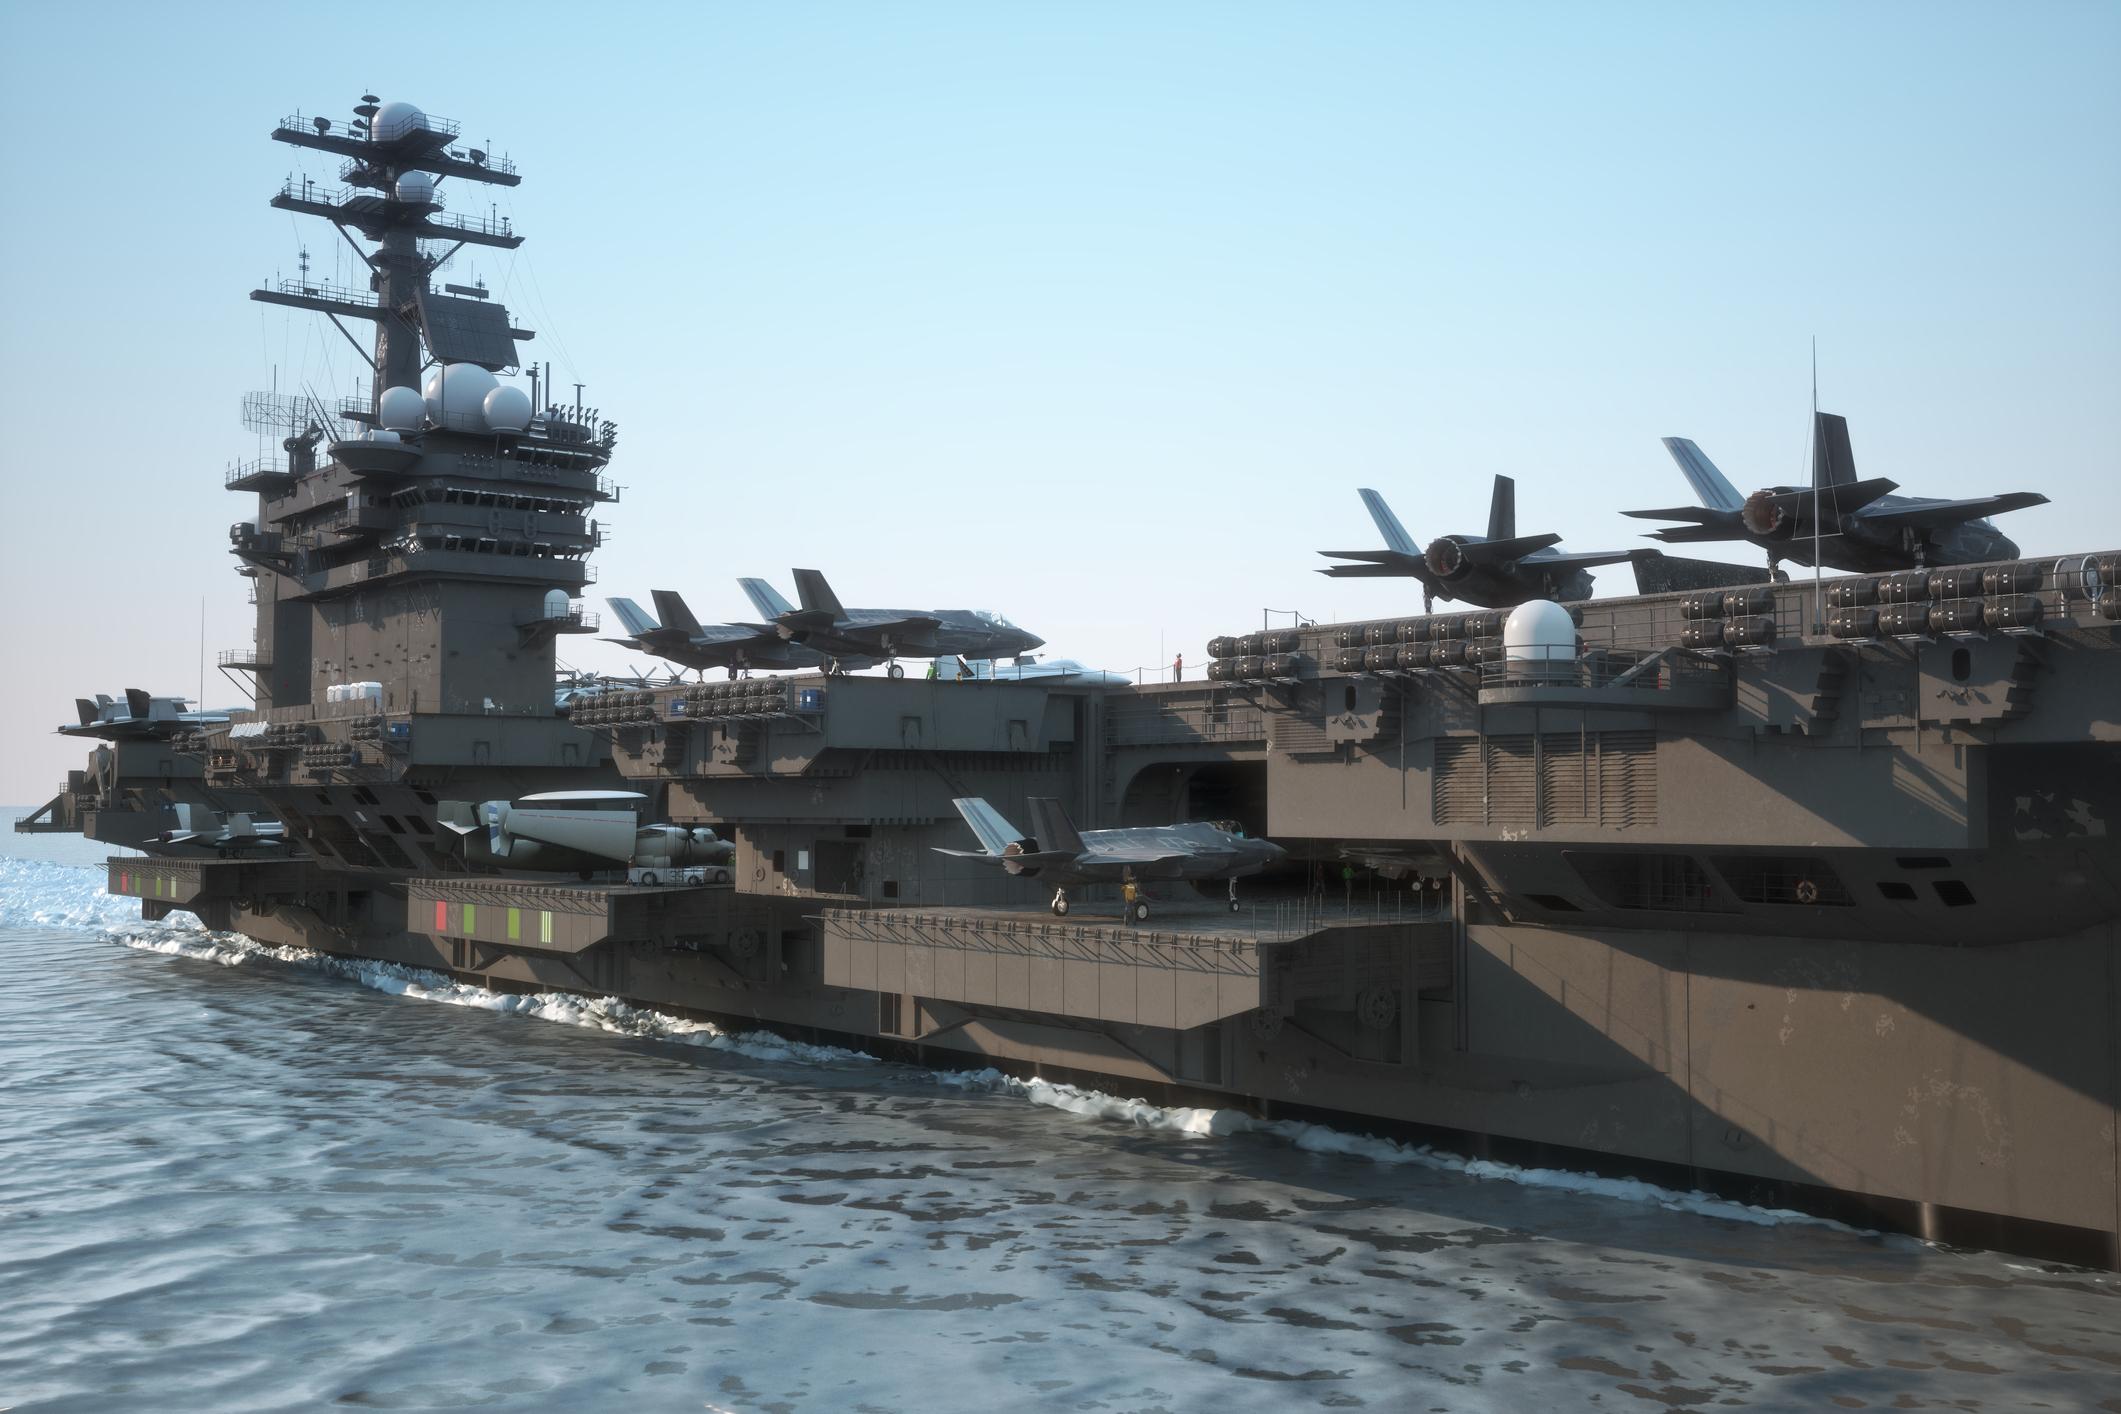 An aircraft carrier in open water.